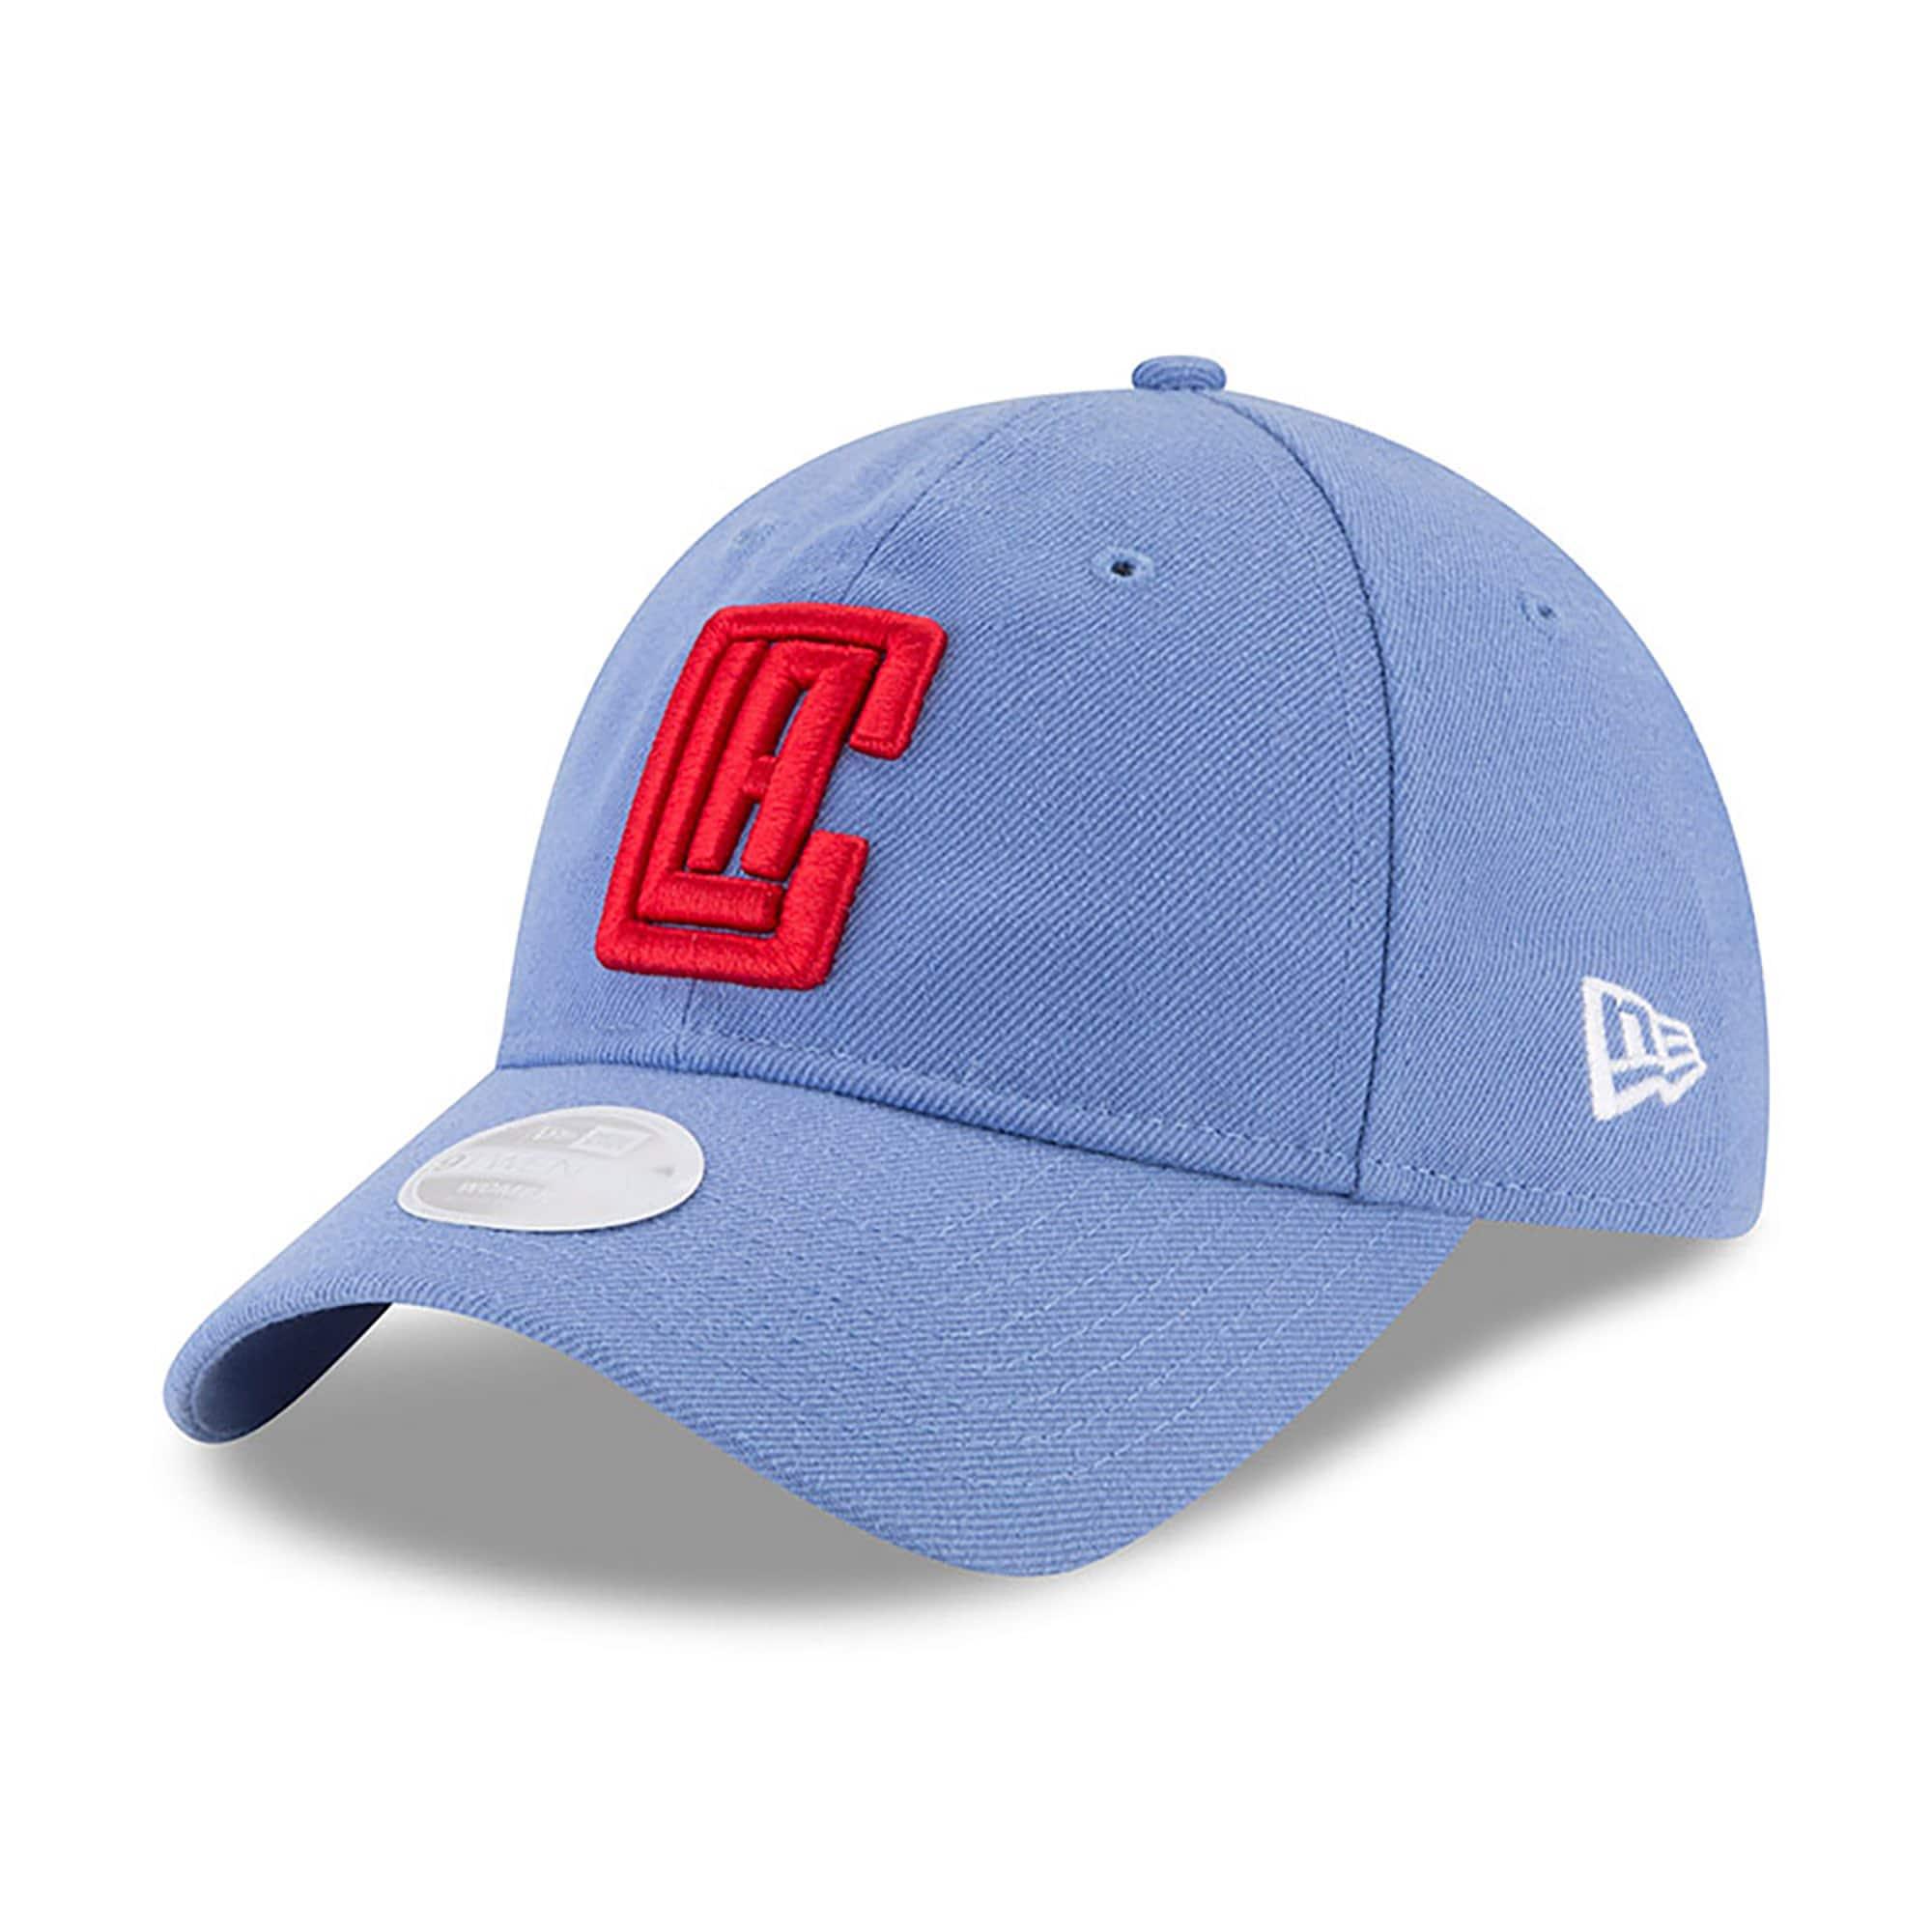 LA Clippers New Era Women's NBA City Series 9TWENTY Adjustable Hat - Light Blue